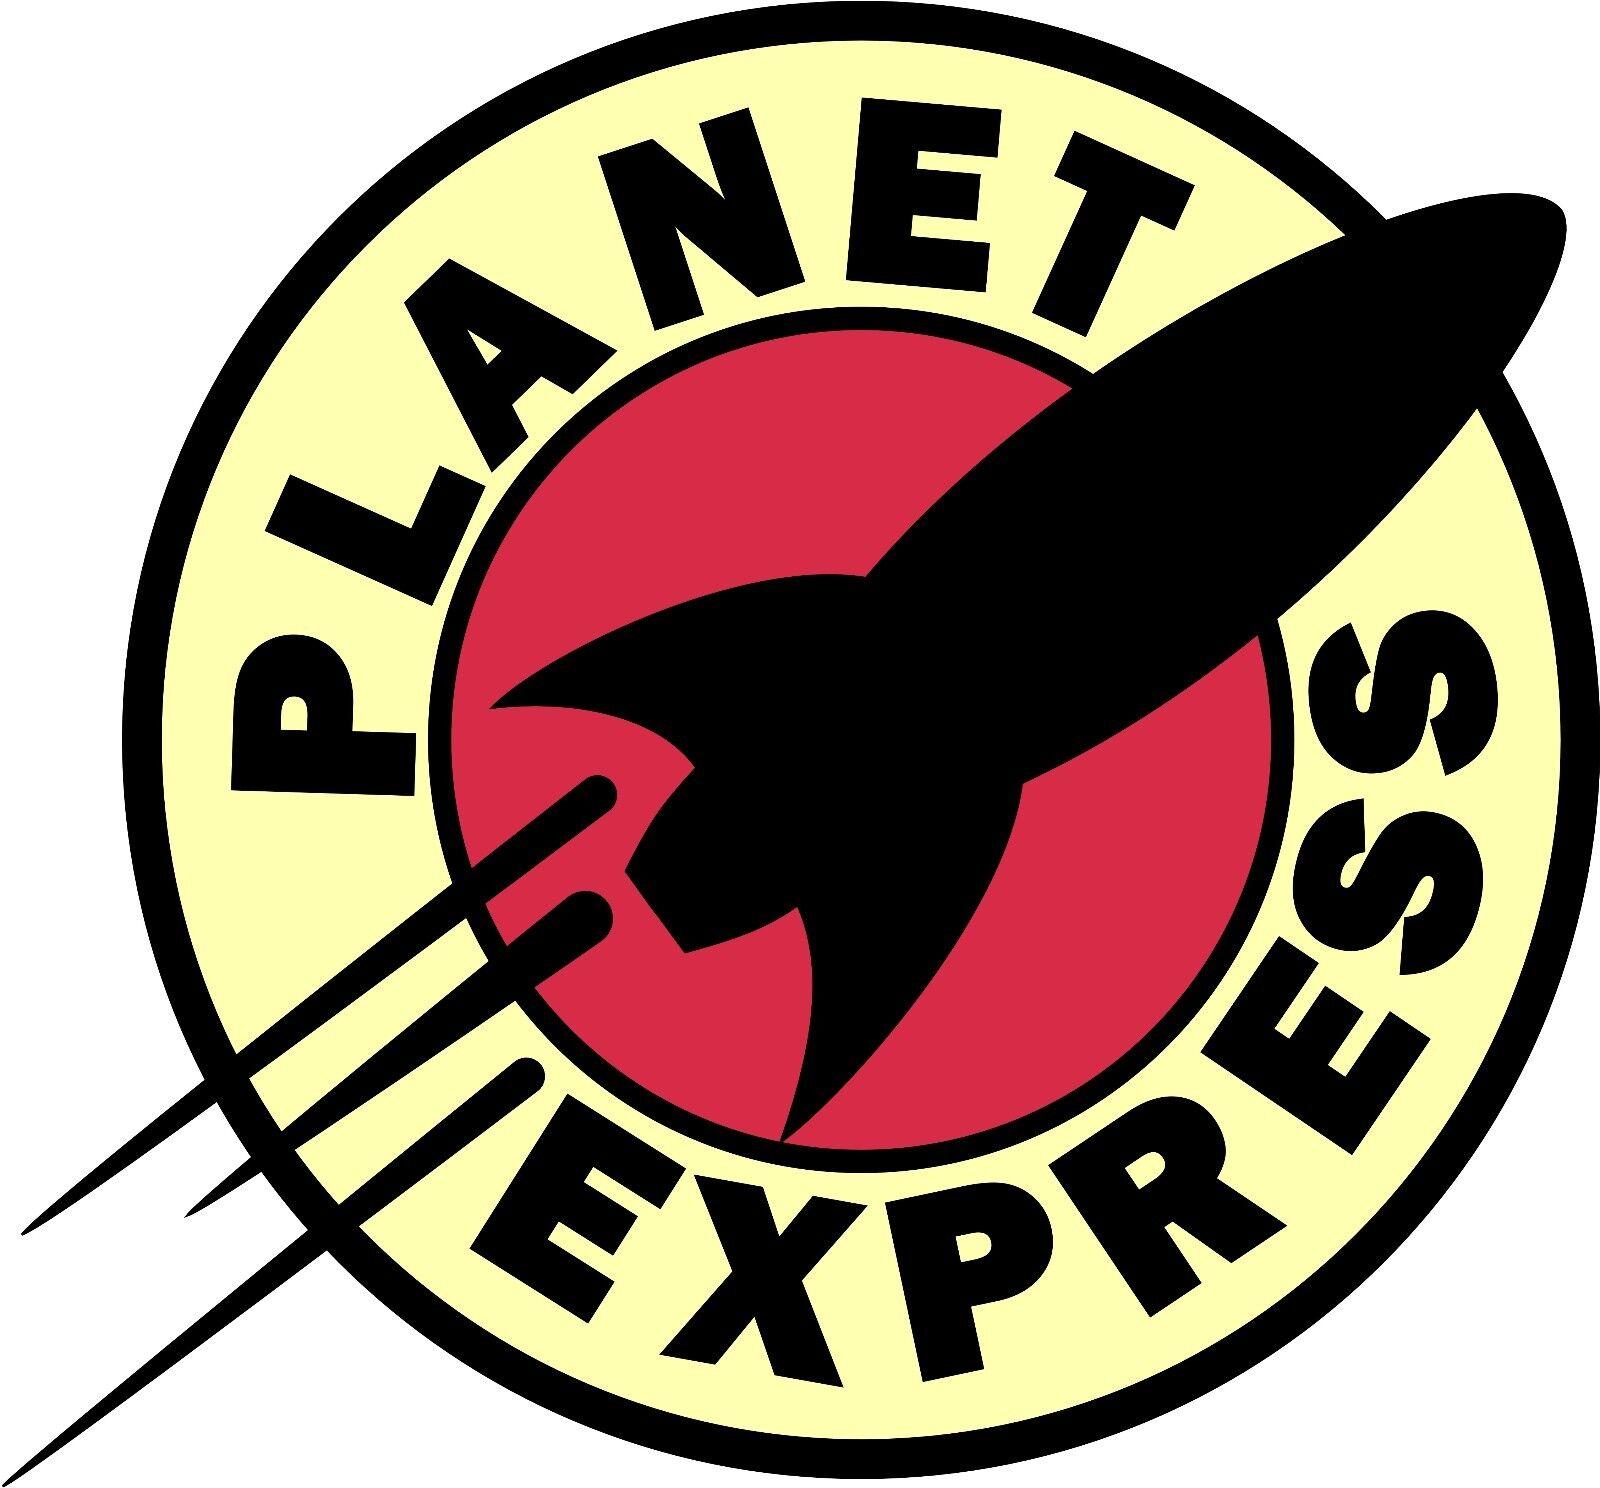 Planet express futurama logo sticker decal ebay resntentobalflowflowcomponenttechnicalissues biocorpaavc Gallery